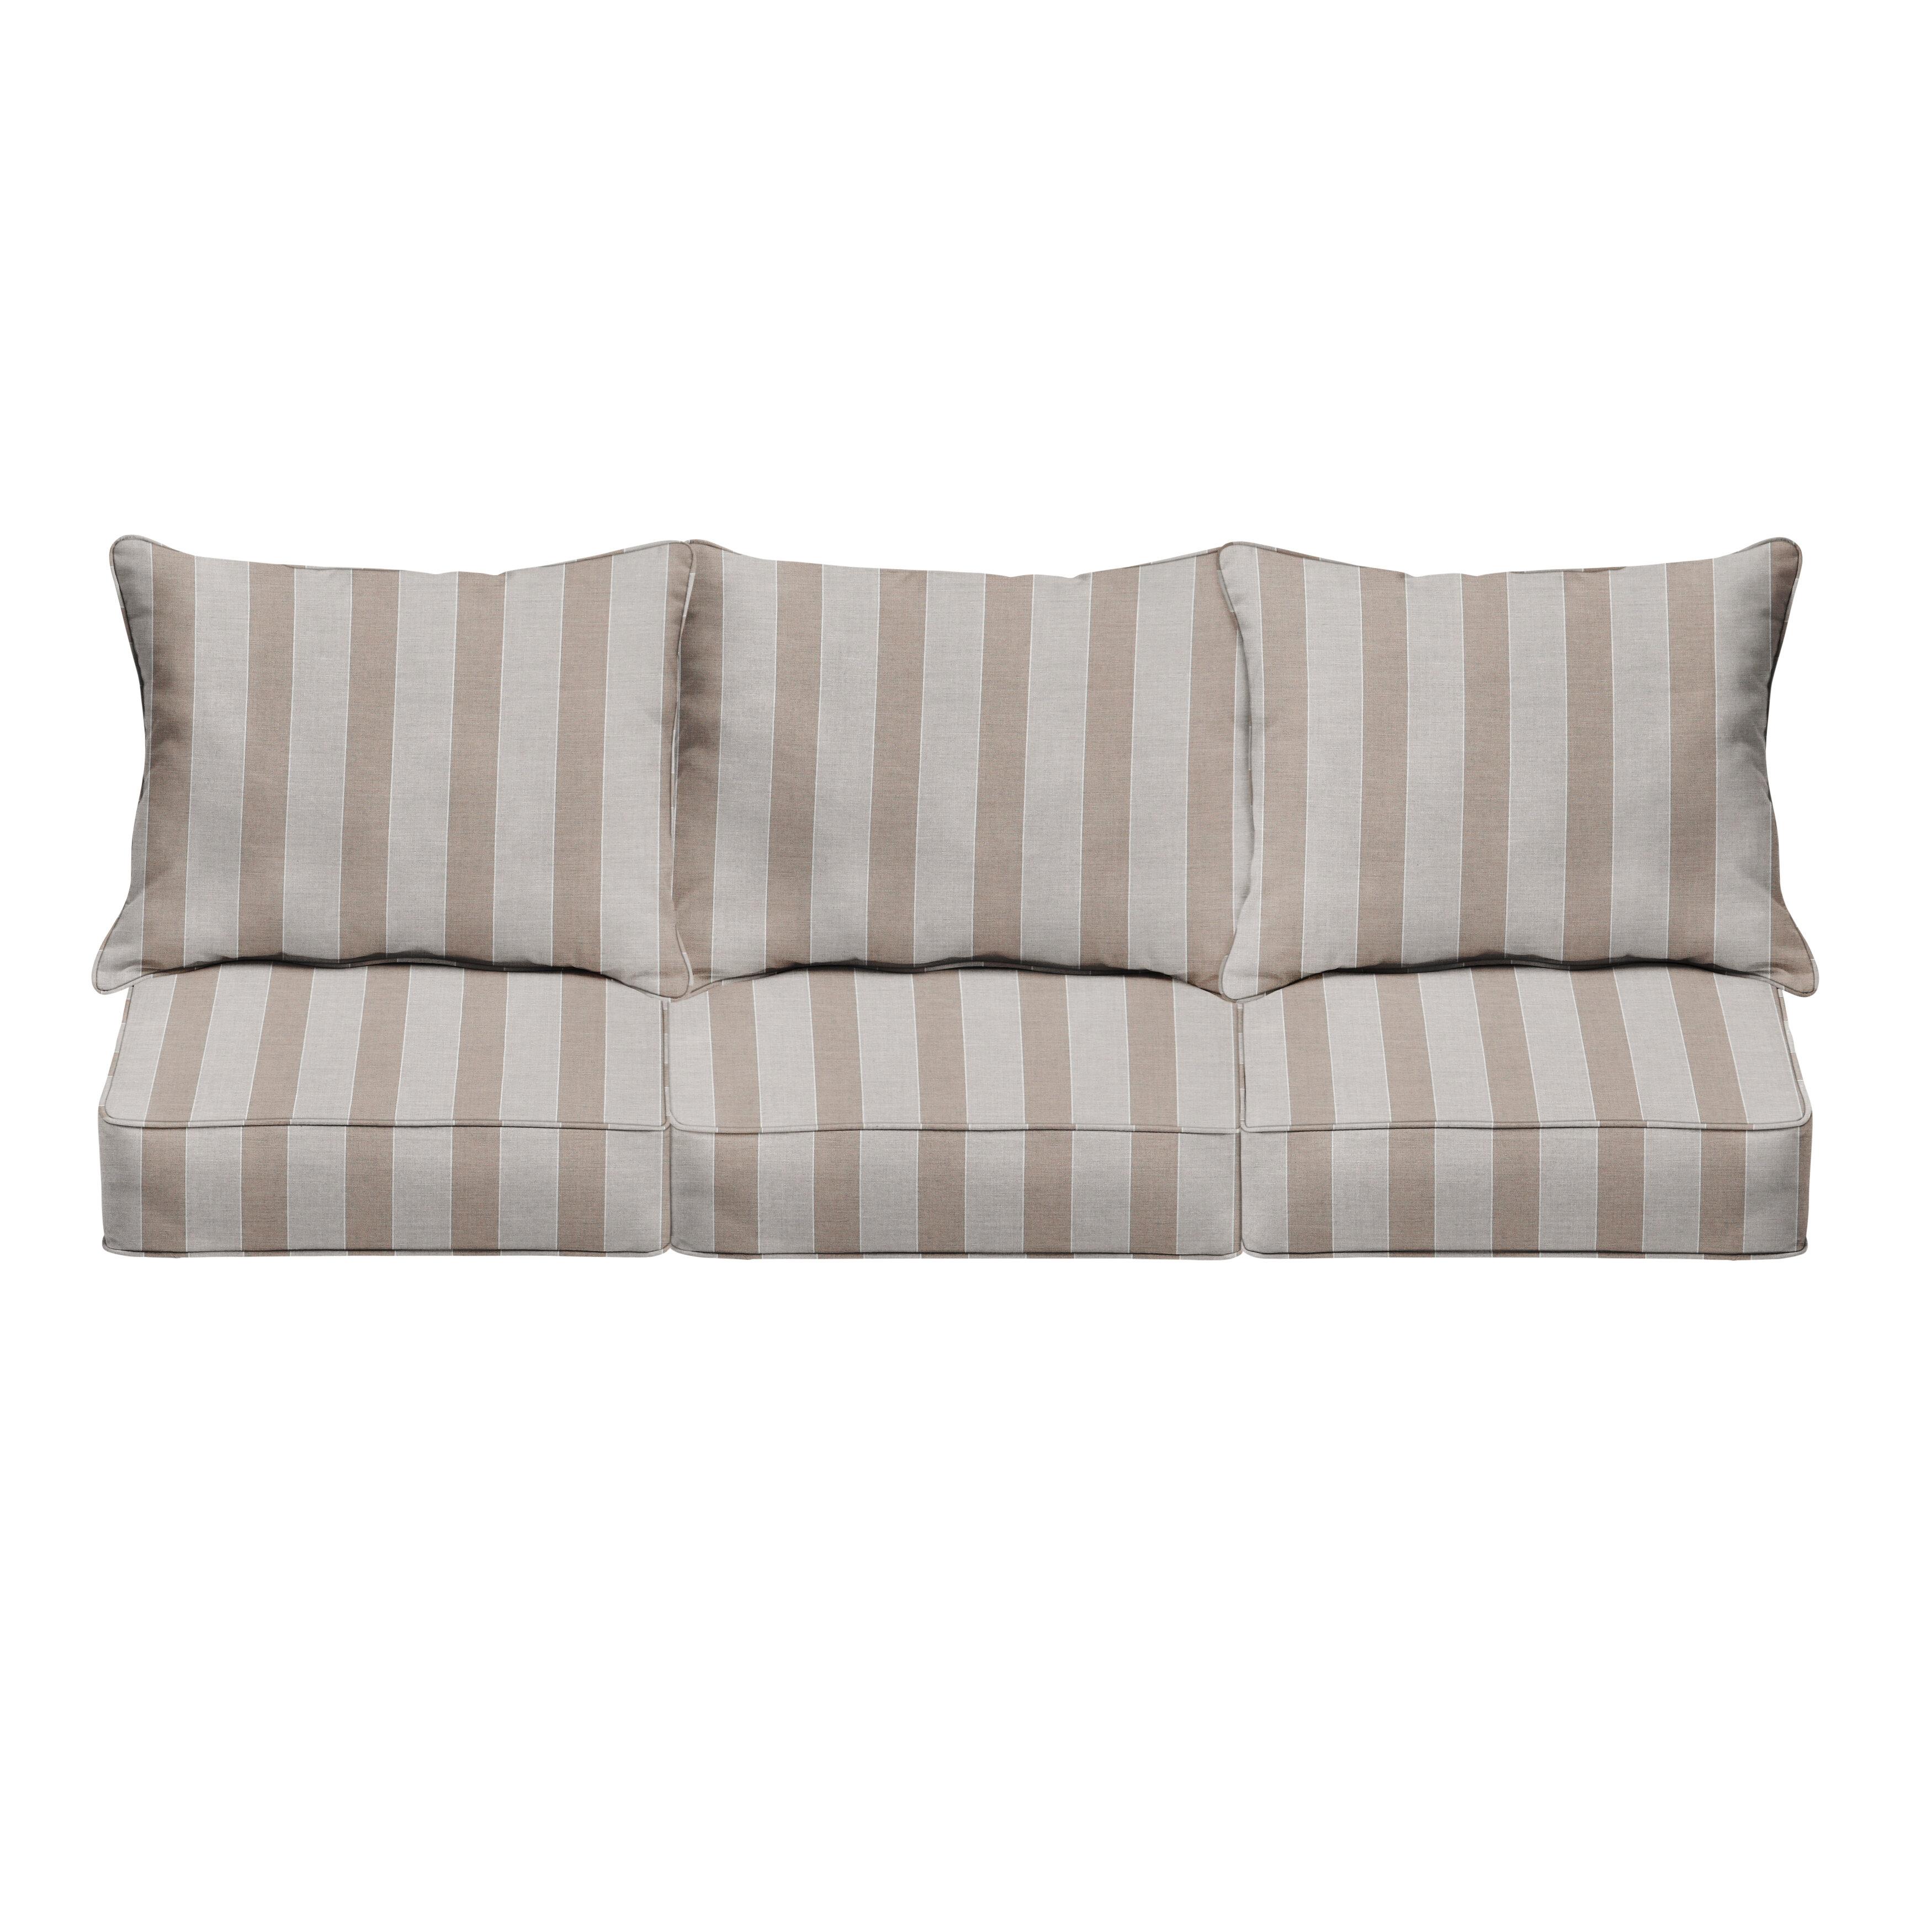 Mozaic Company Sunbrella Ranfe Dune Indoor Outdoor Sofa Cushion Set Set Of 6 Wayfair